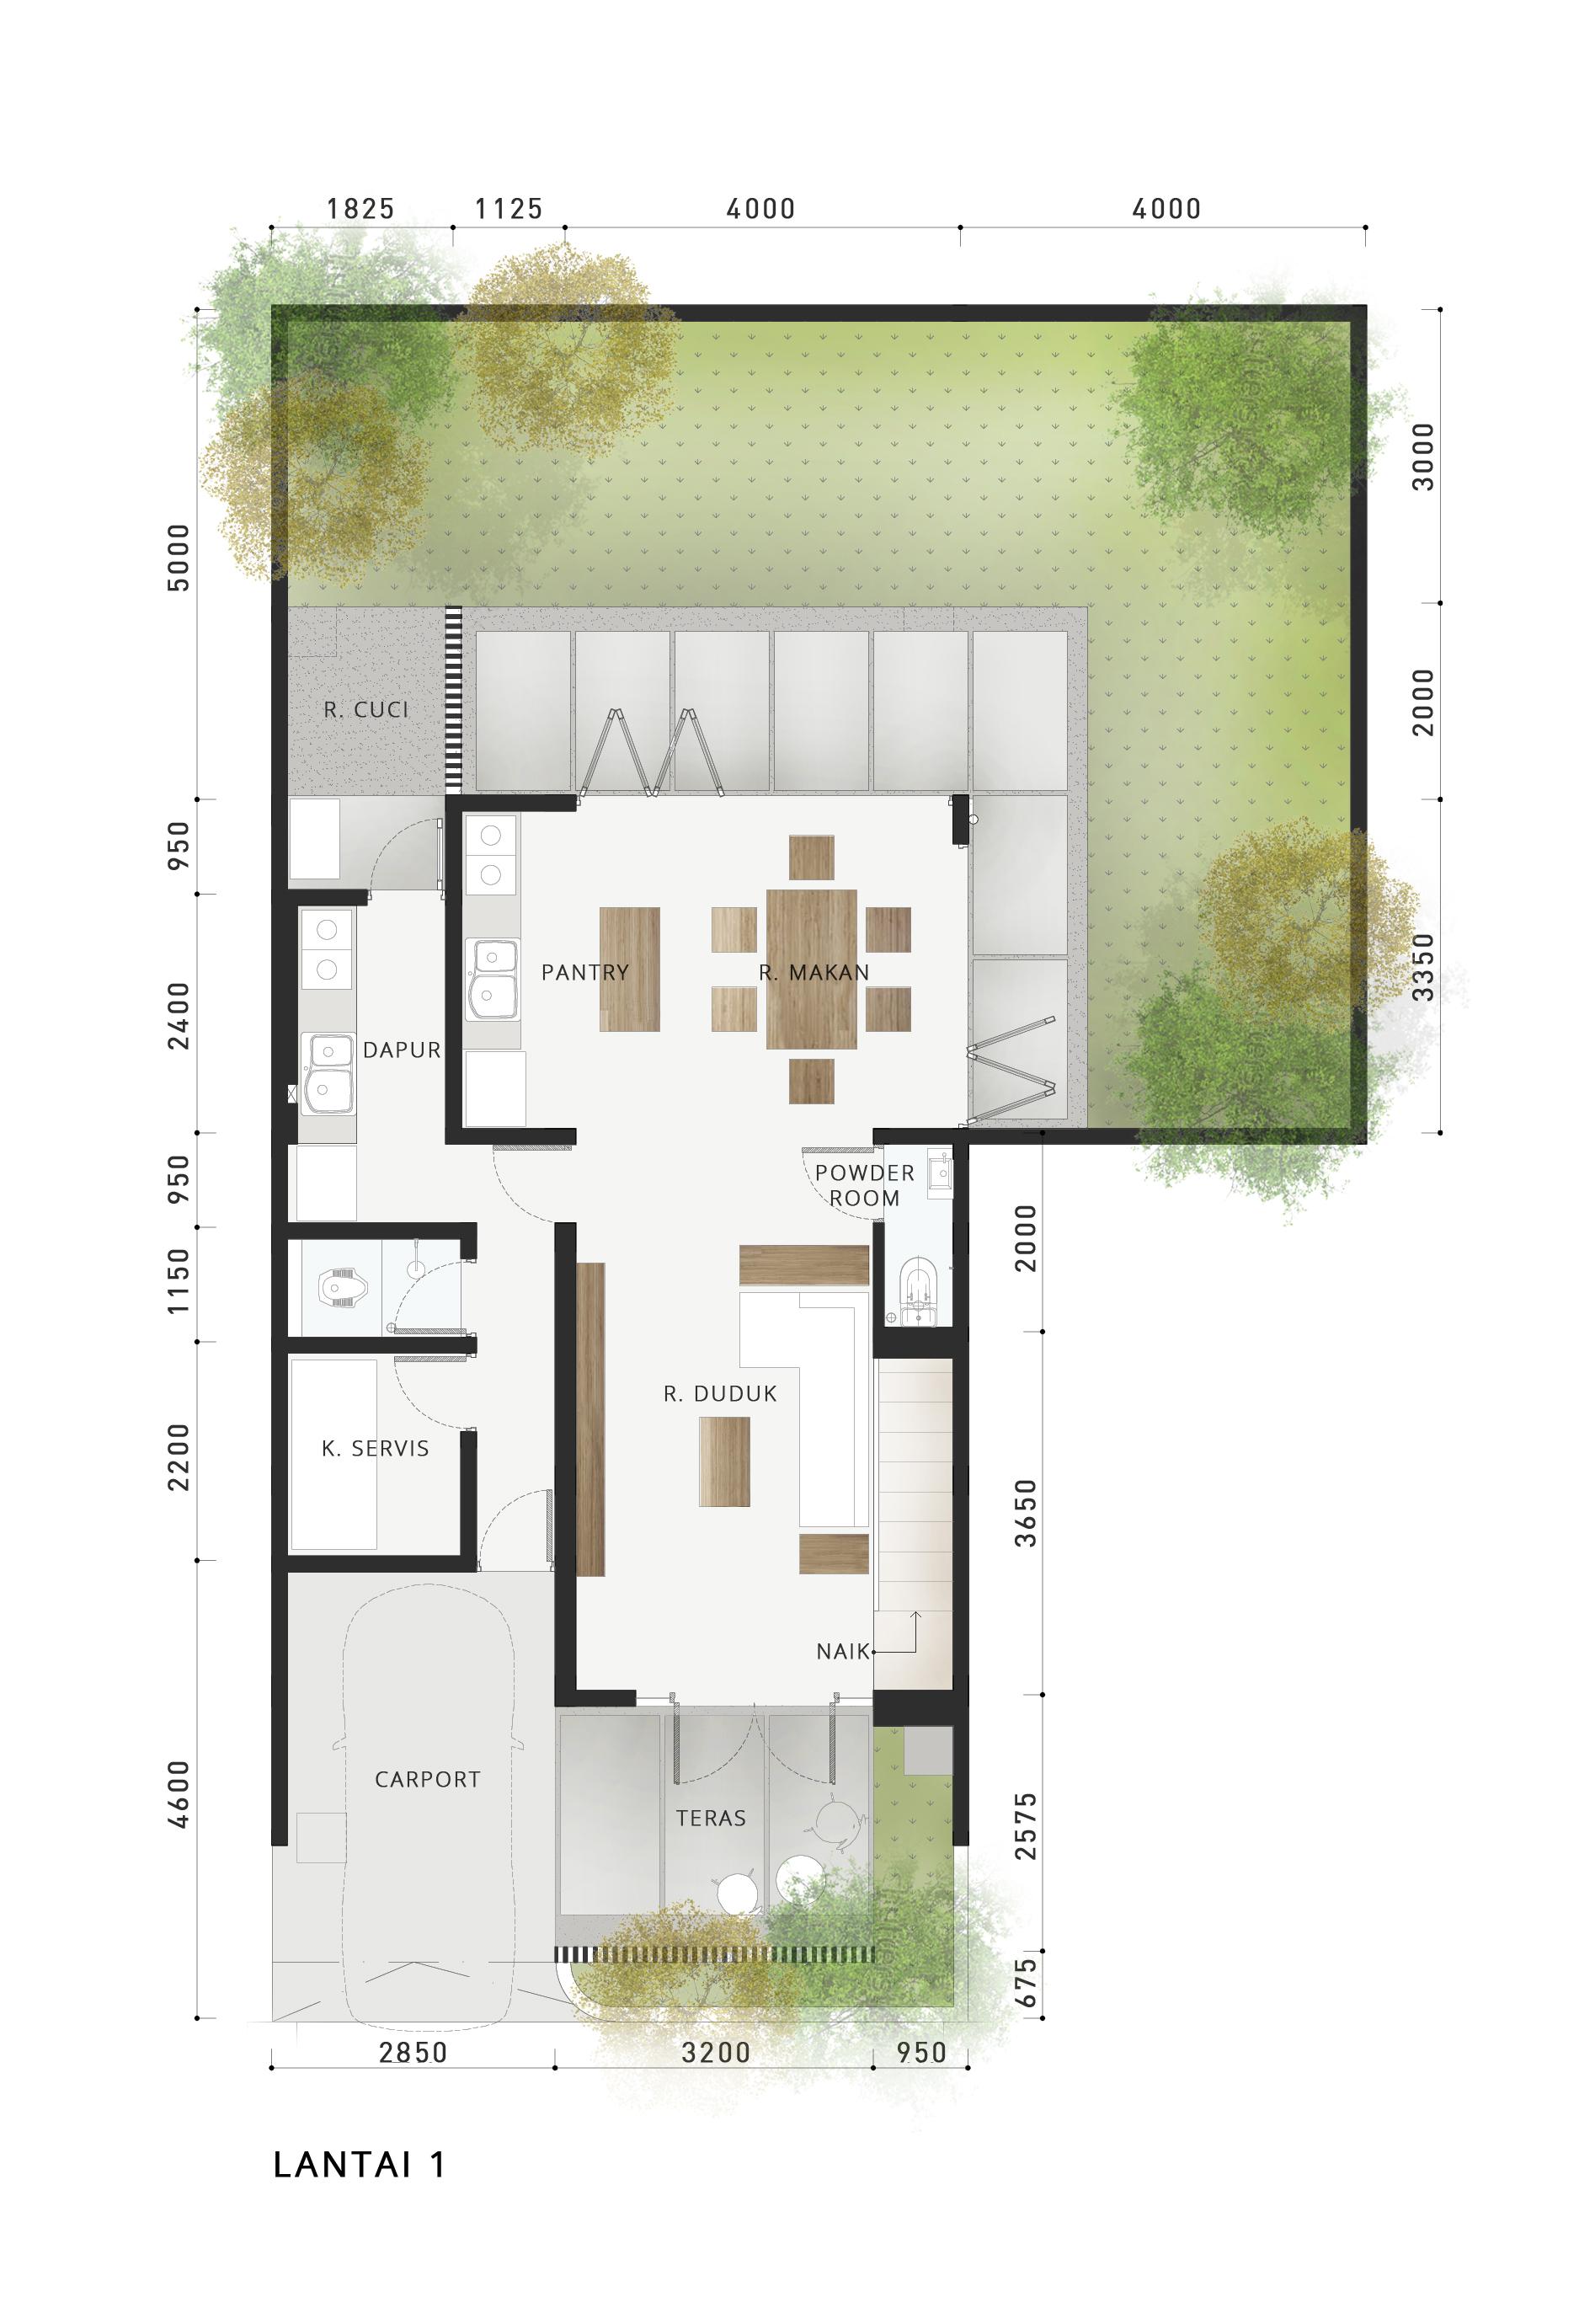 LUX lantai 1.jpg